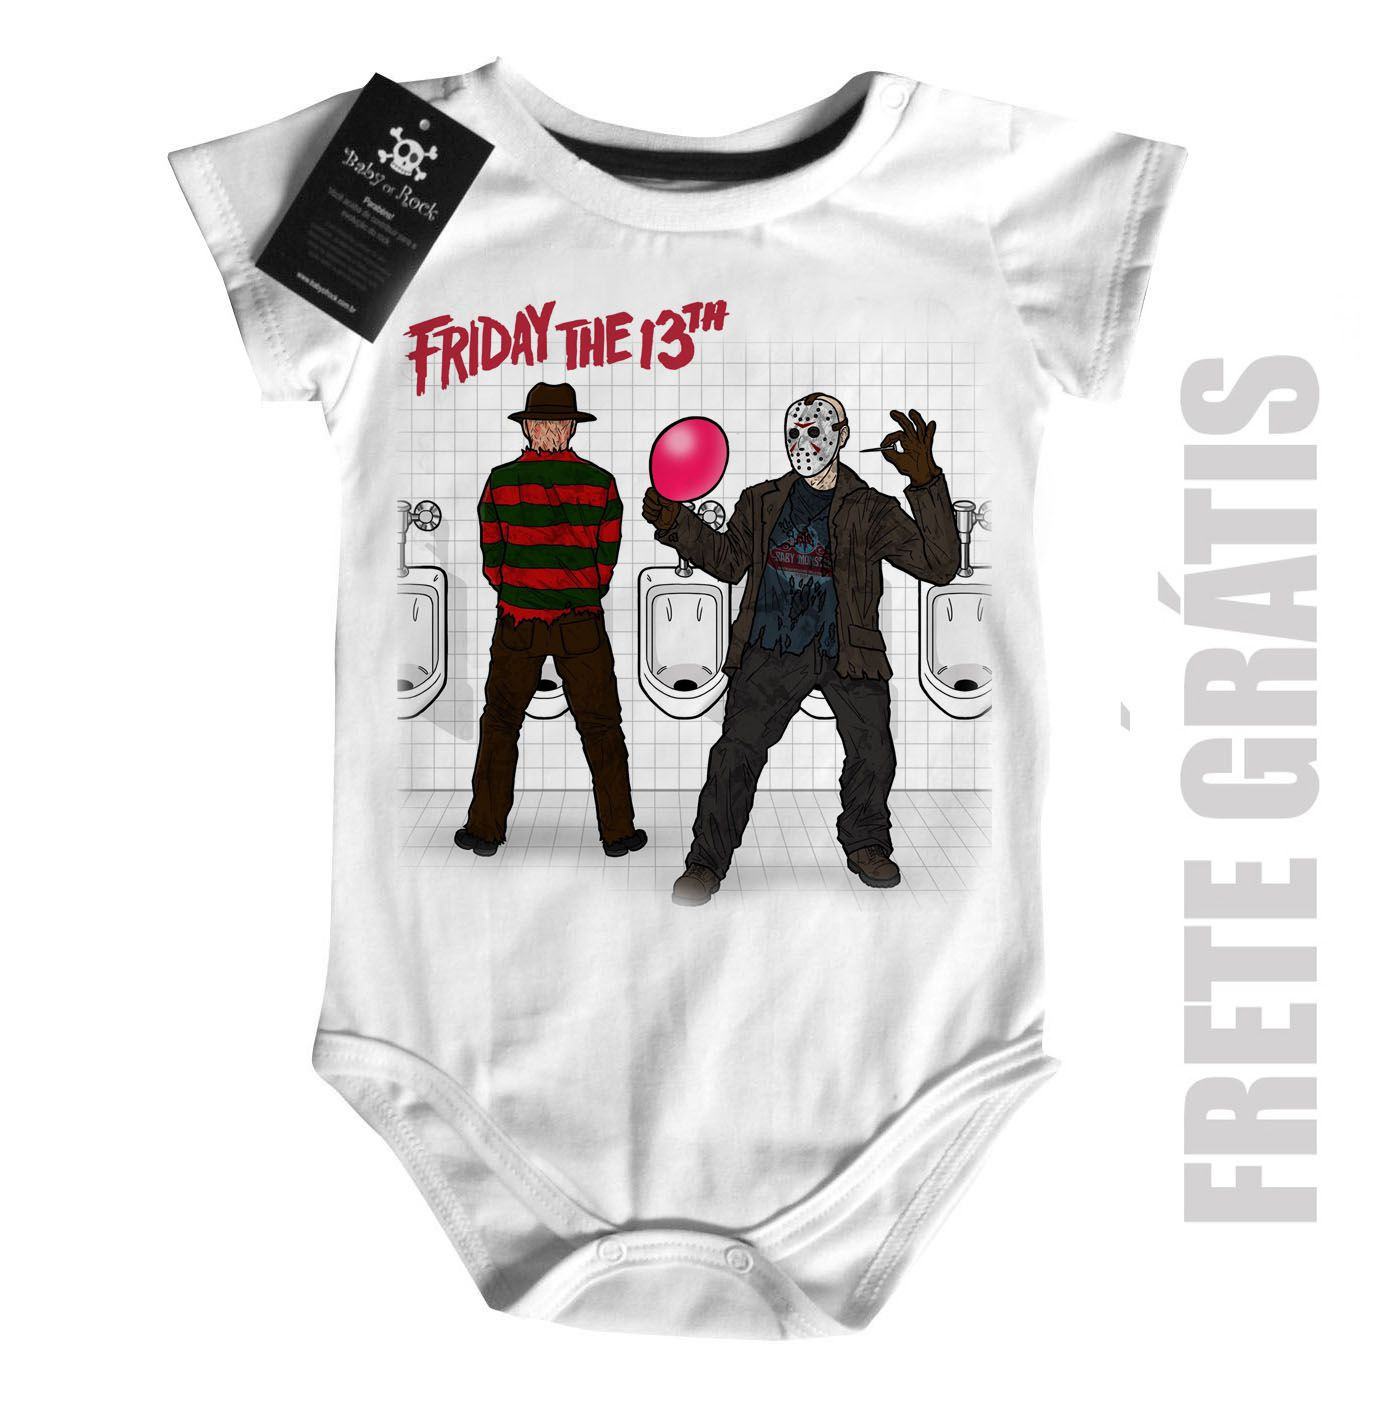 Body Bebê terror - Sexta Feira 13 - White  - Baby Monster S/A